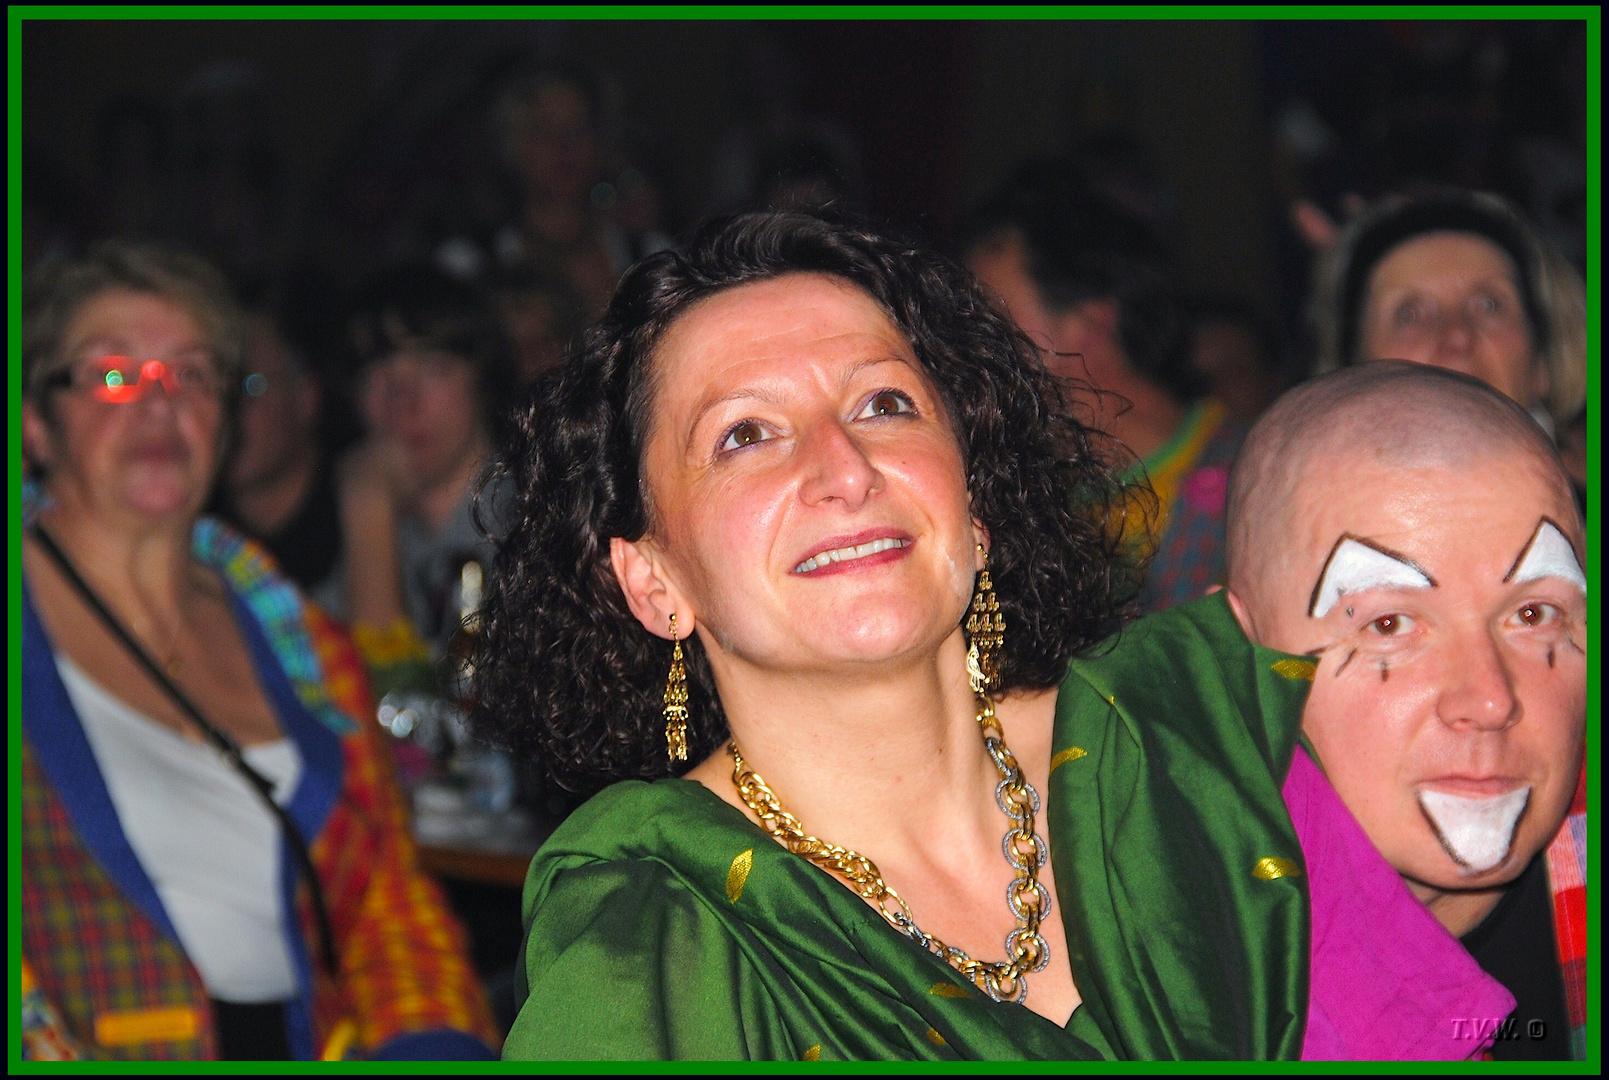 Karneval in Remagen Kripp